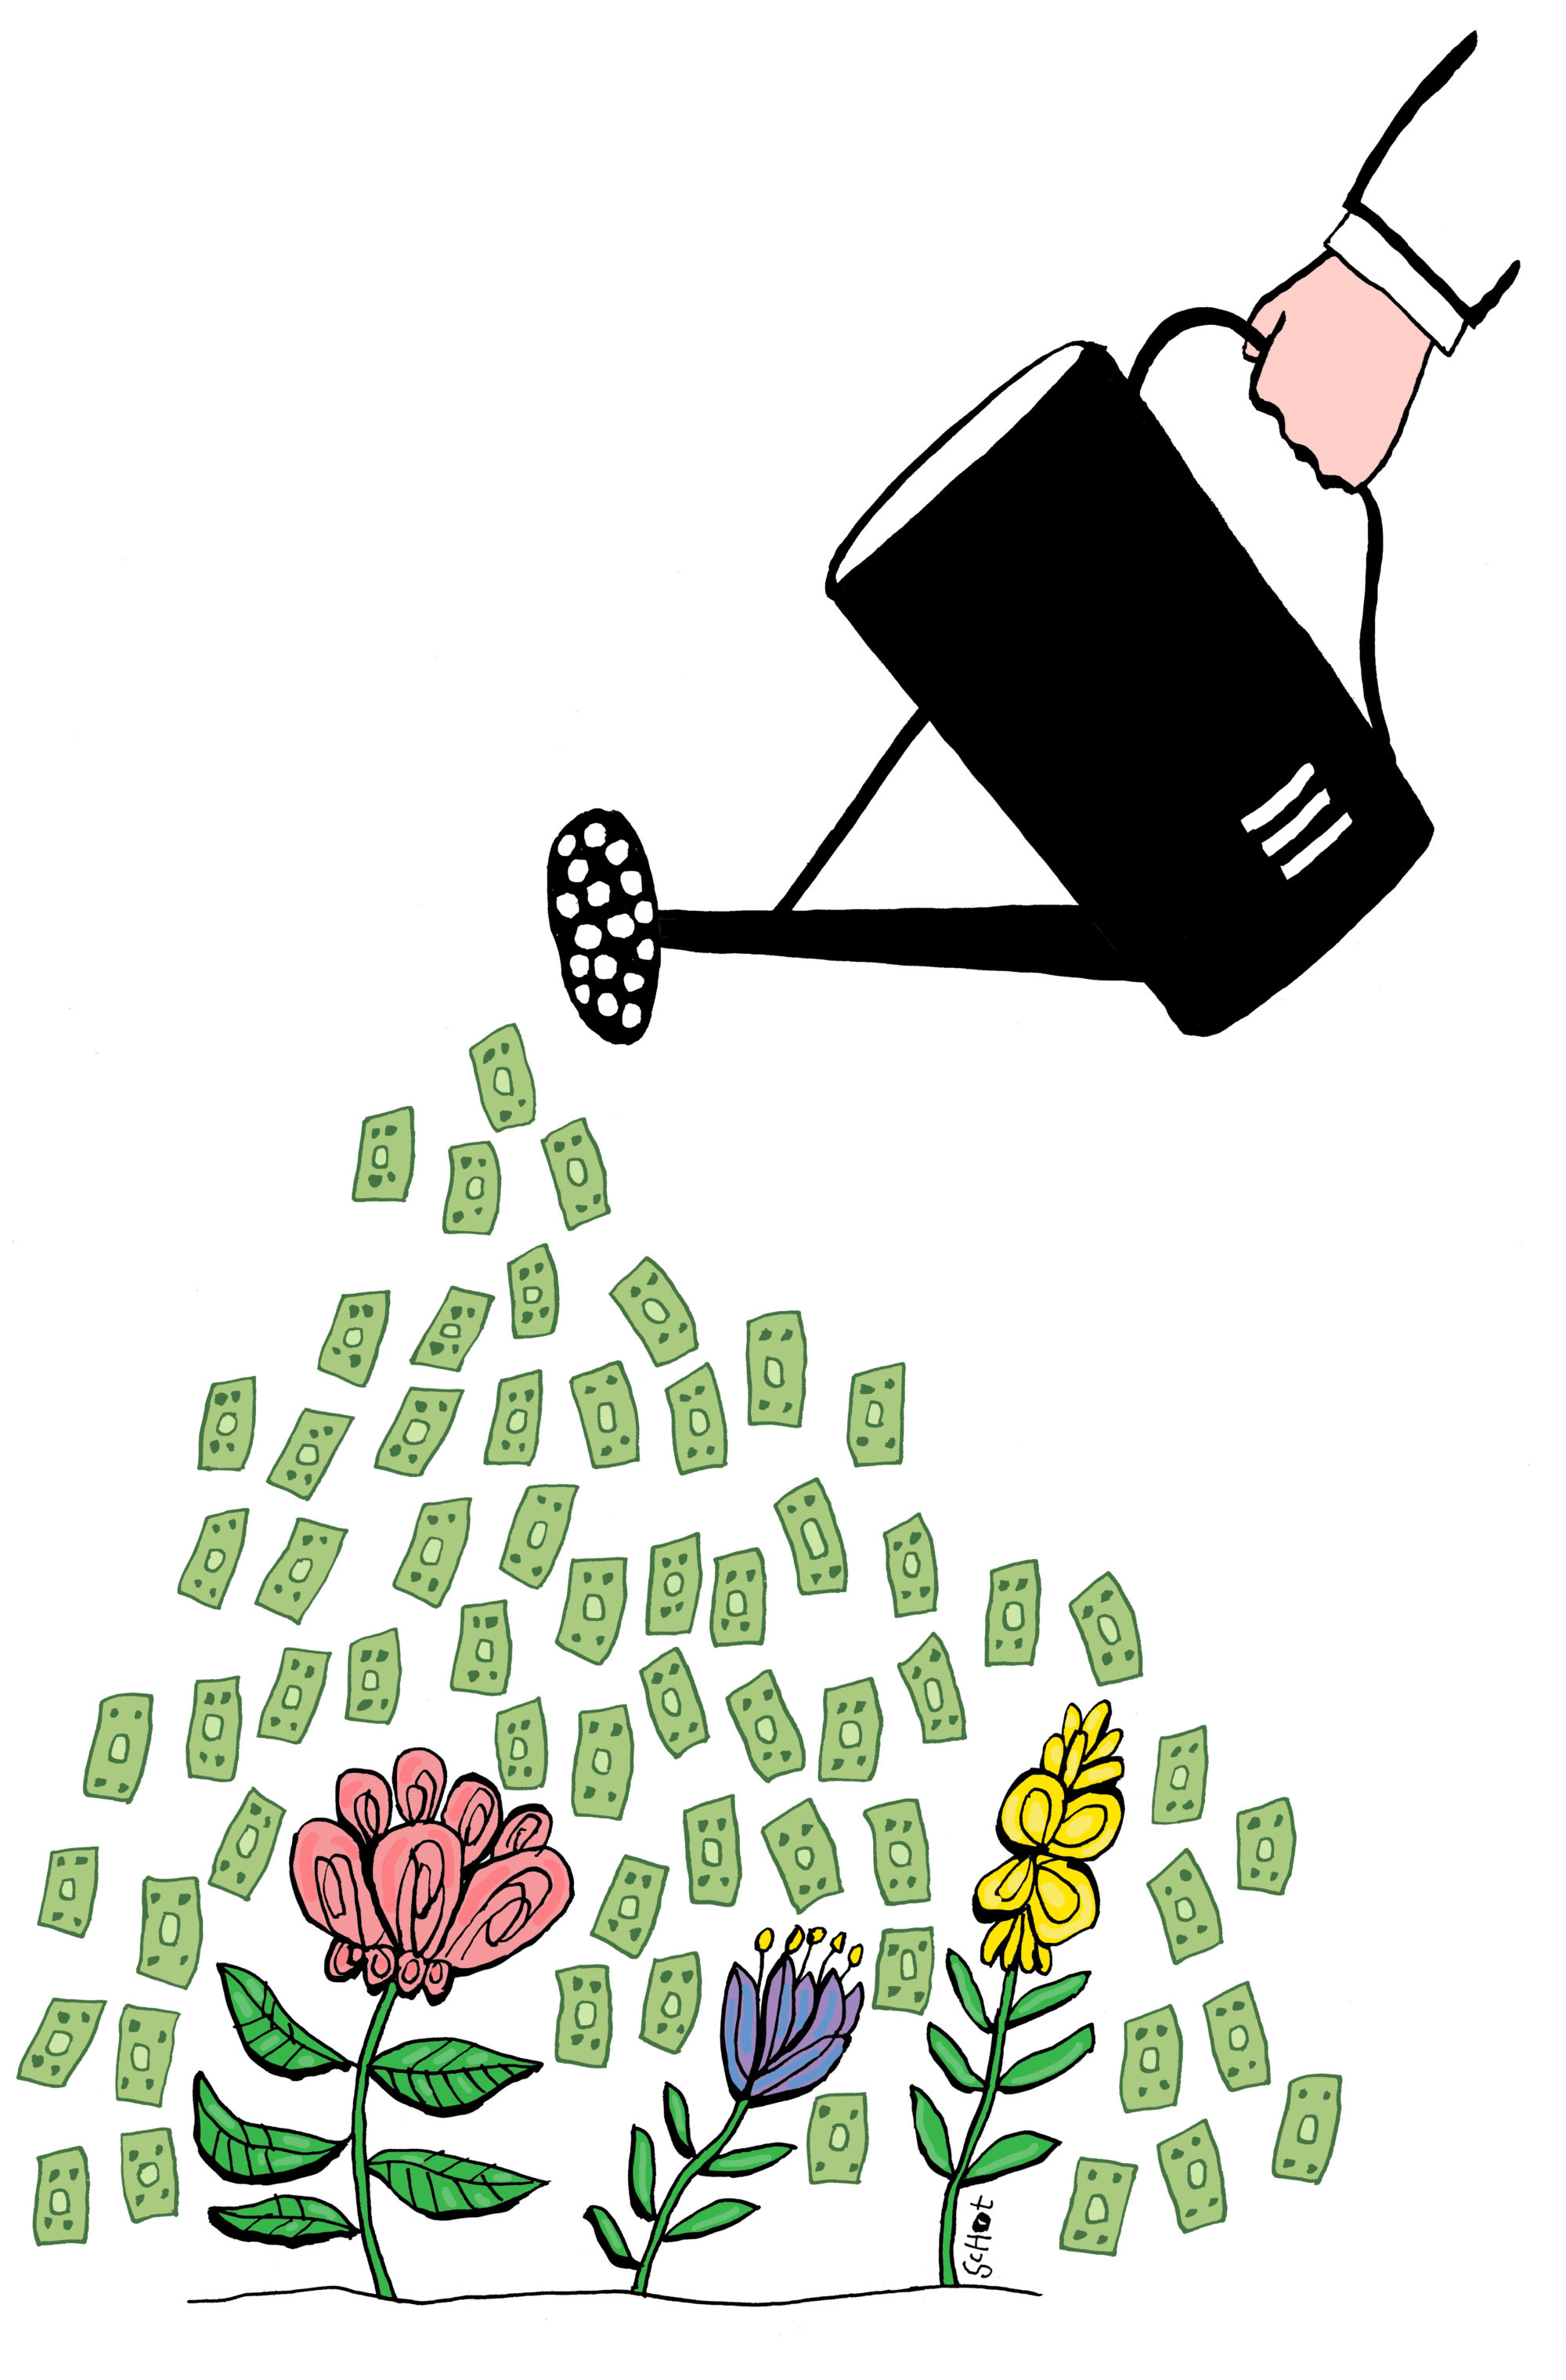 em-filantropie gieter geld